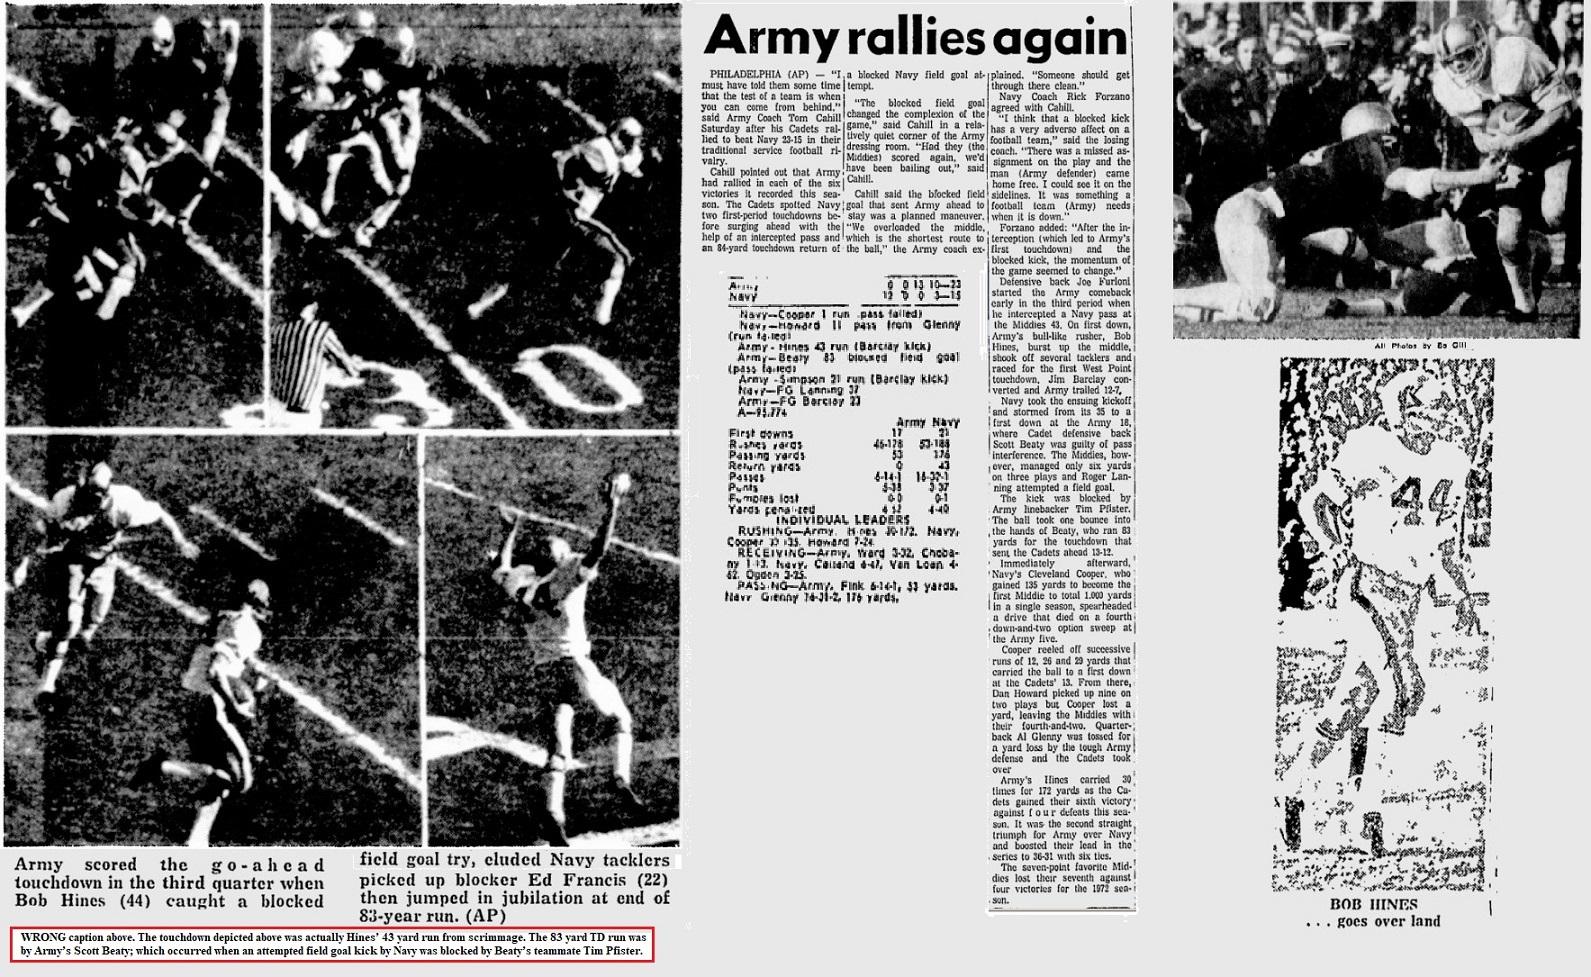 ArmyFB_1972_BobHines_vsNavy